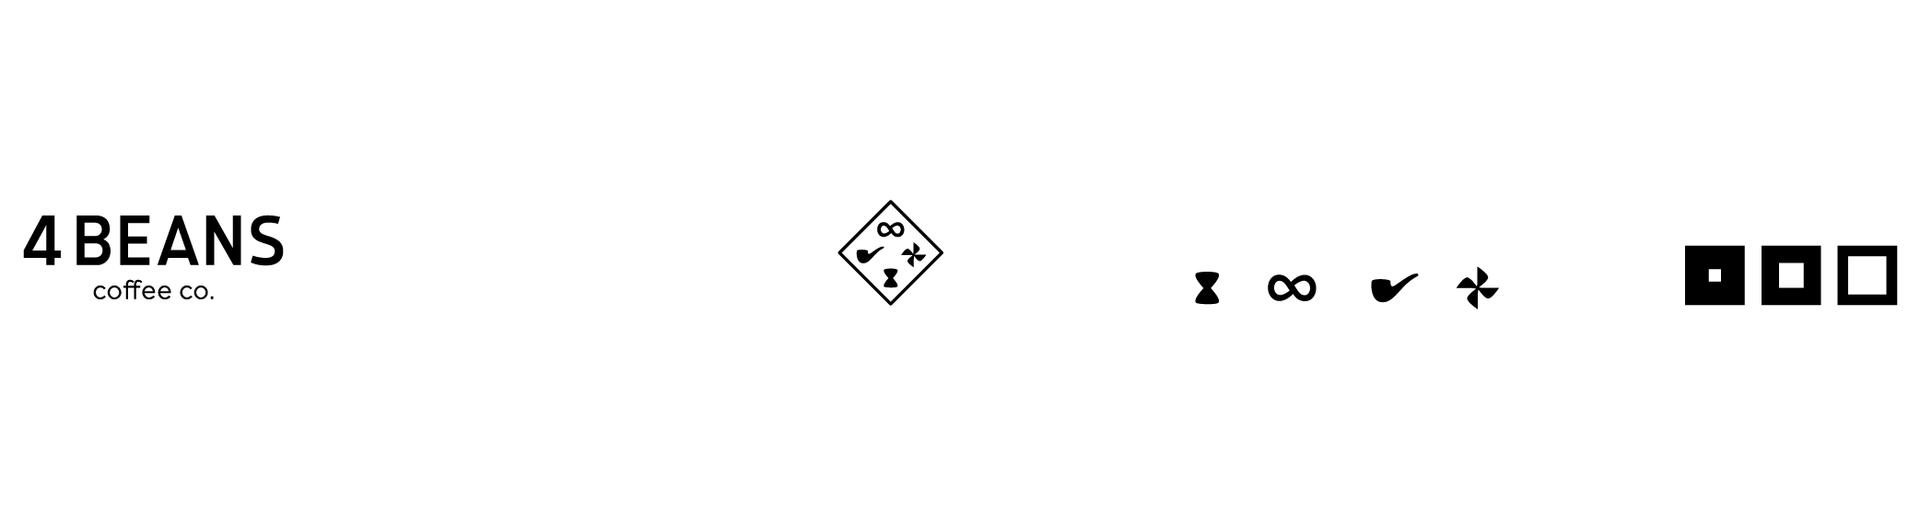 apoc_studio_gustavo_francesconi_logo_30.